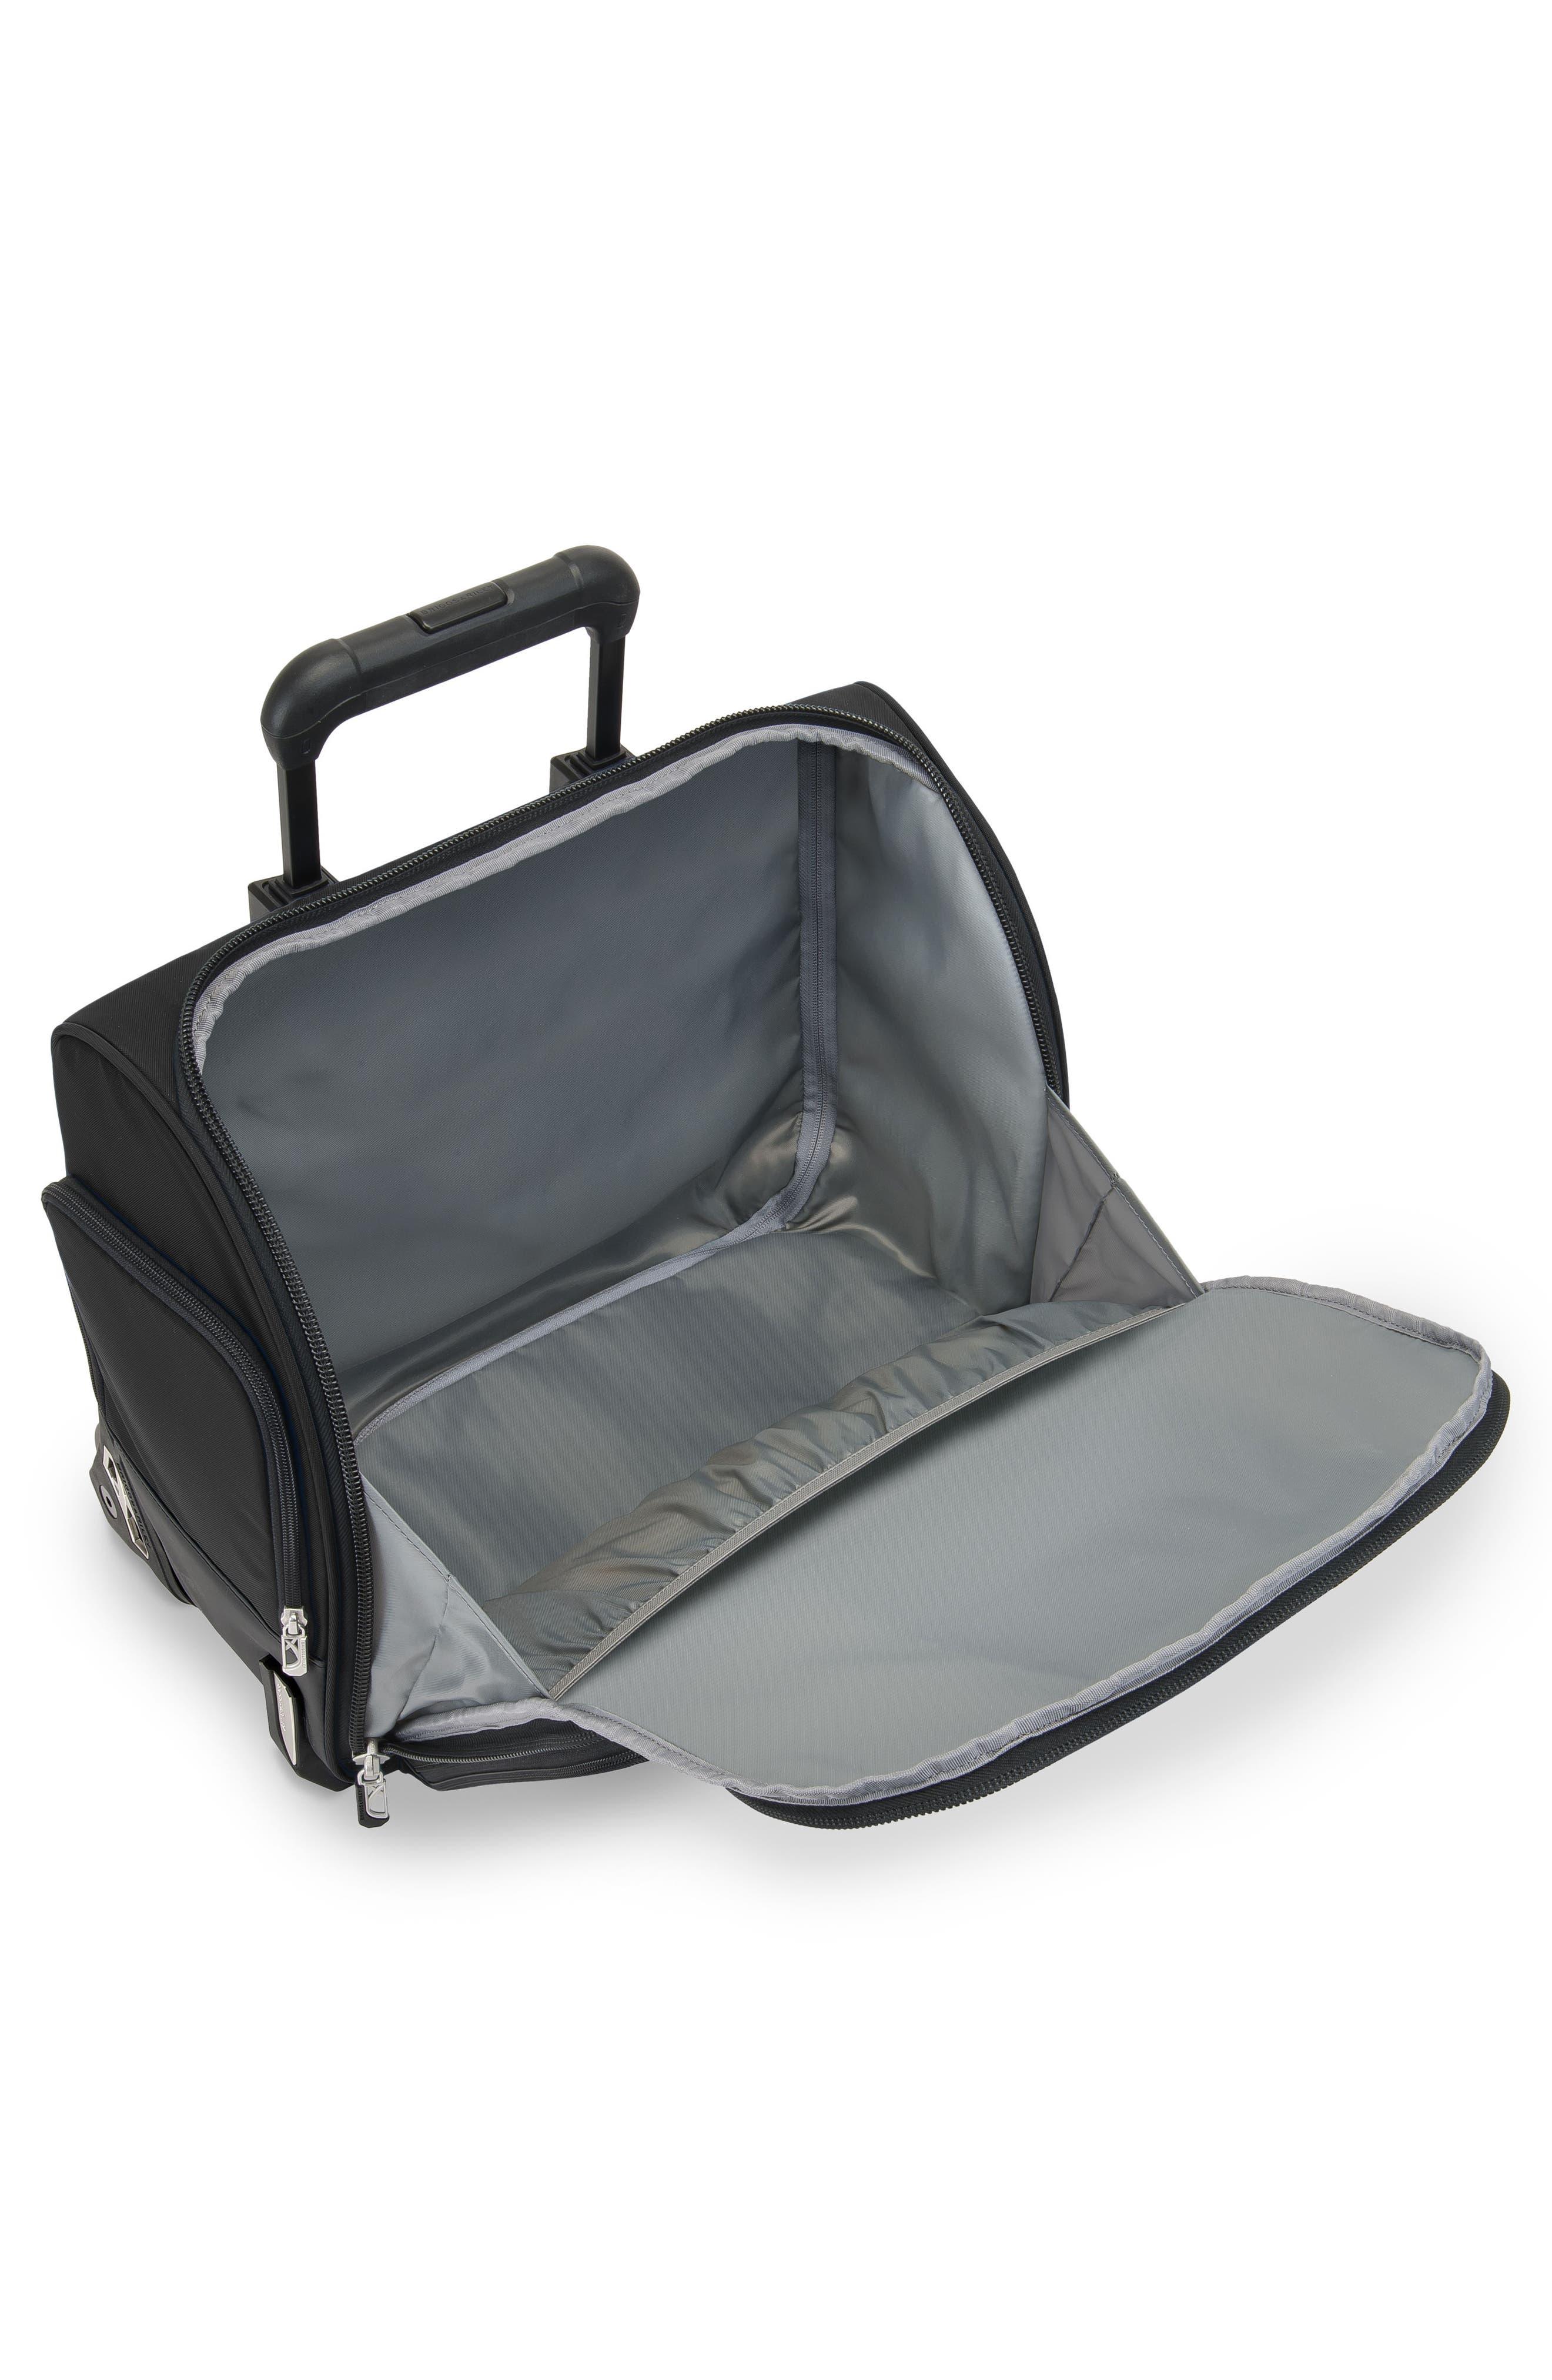 Alternate Image 2  - Briggs & Riley BRX Explore Wheeled Cabin Bag